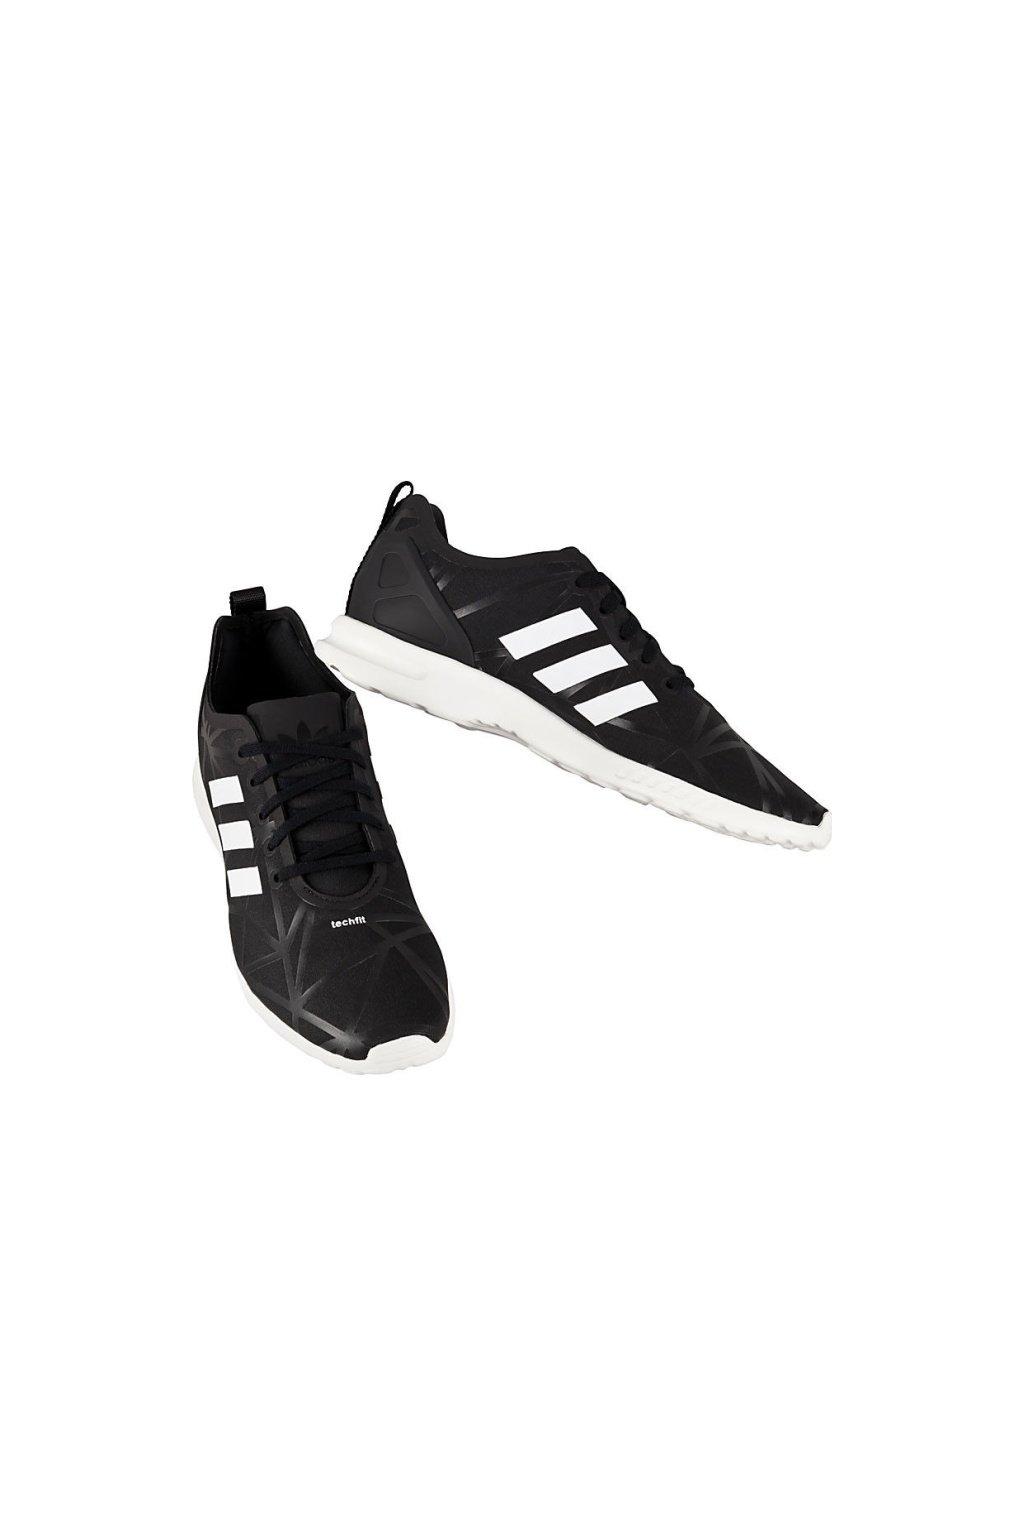 9d2b69c194c7 Dámska obuv Adidas ZX FLUX ADV SMOOTH - Fresh sport